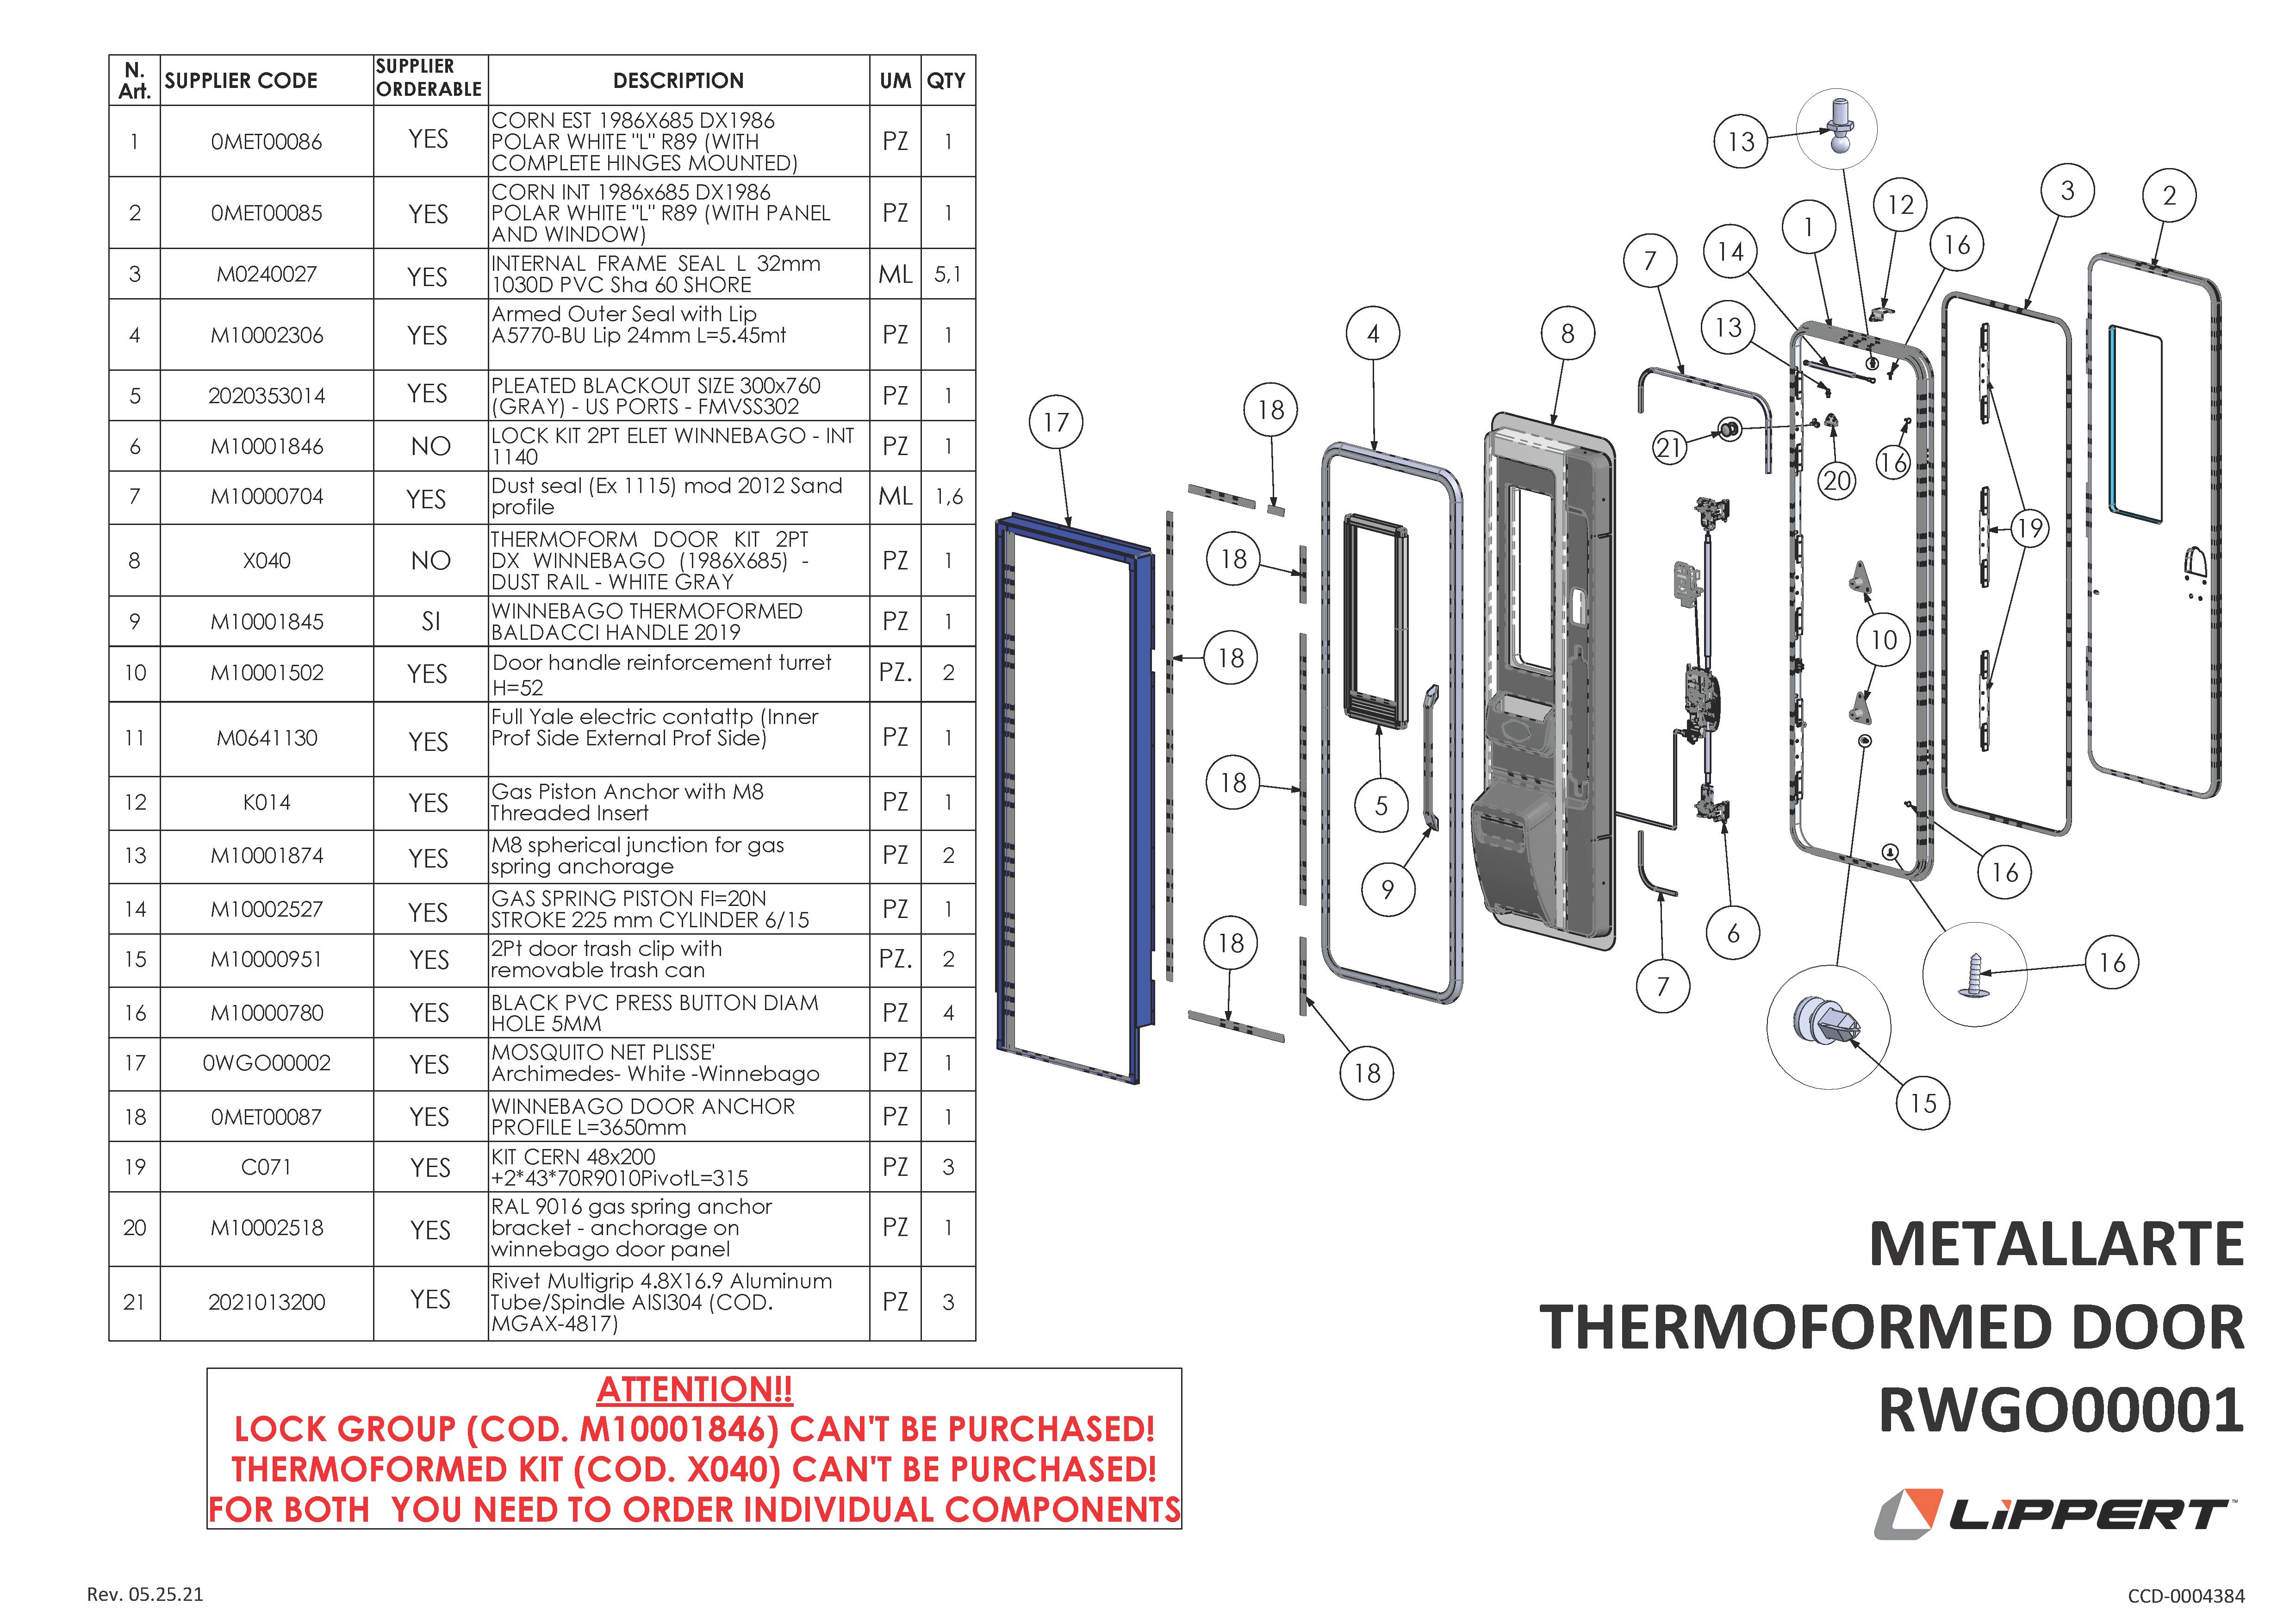 Metallarte Thermoformed Door RWGO00001 Components